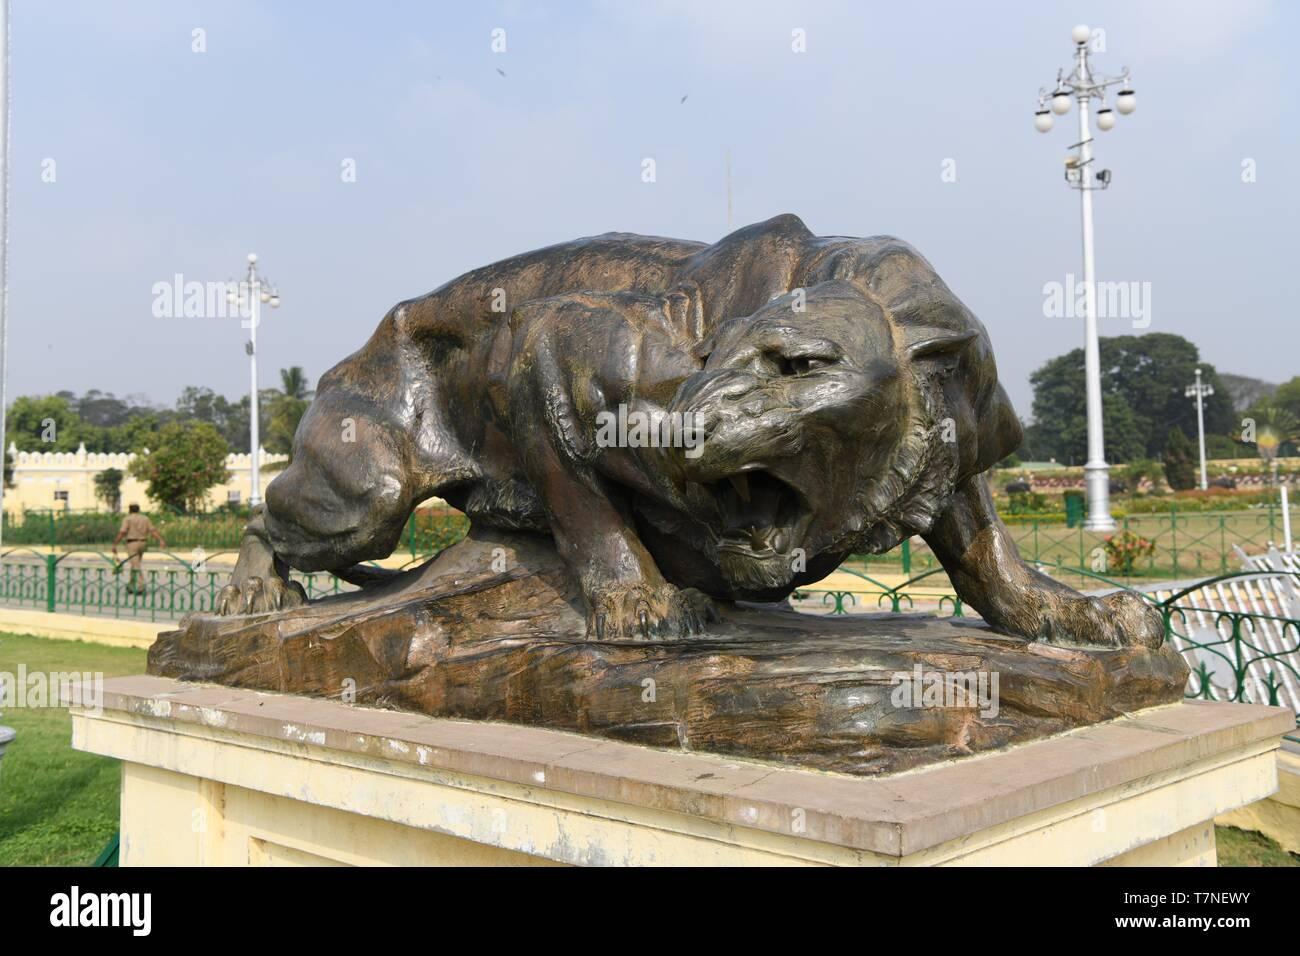 The Royal Seat of the Maharajas of Mysore, Mysore Palace, India Stock Photo